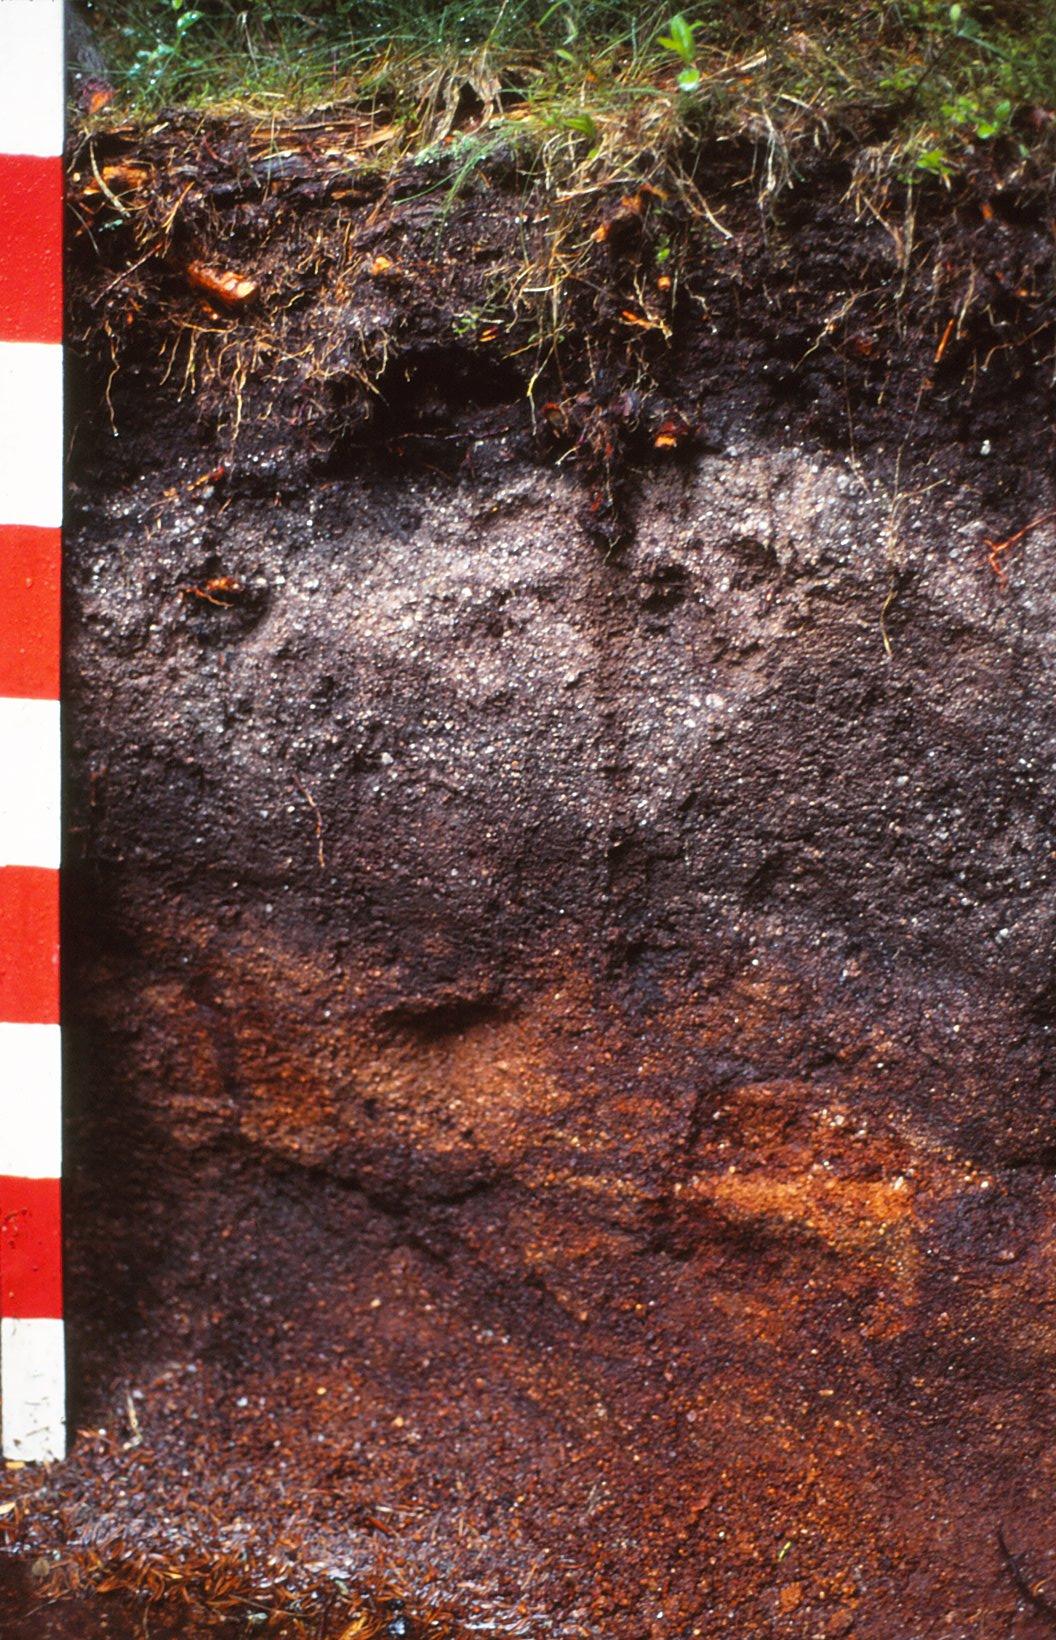 Profil glebowy, autor: U. Burkhardt, źródło: https://pl.wikipedia.org/wiki/Plik:Eisenhumuspodsol.jpg